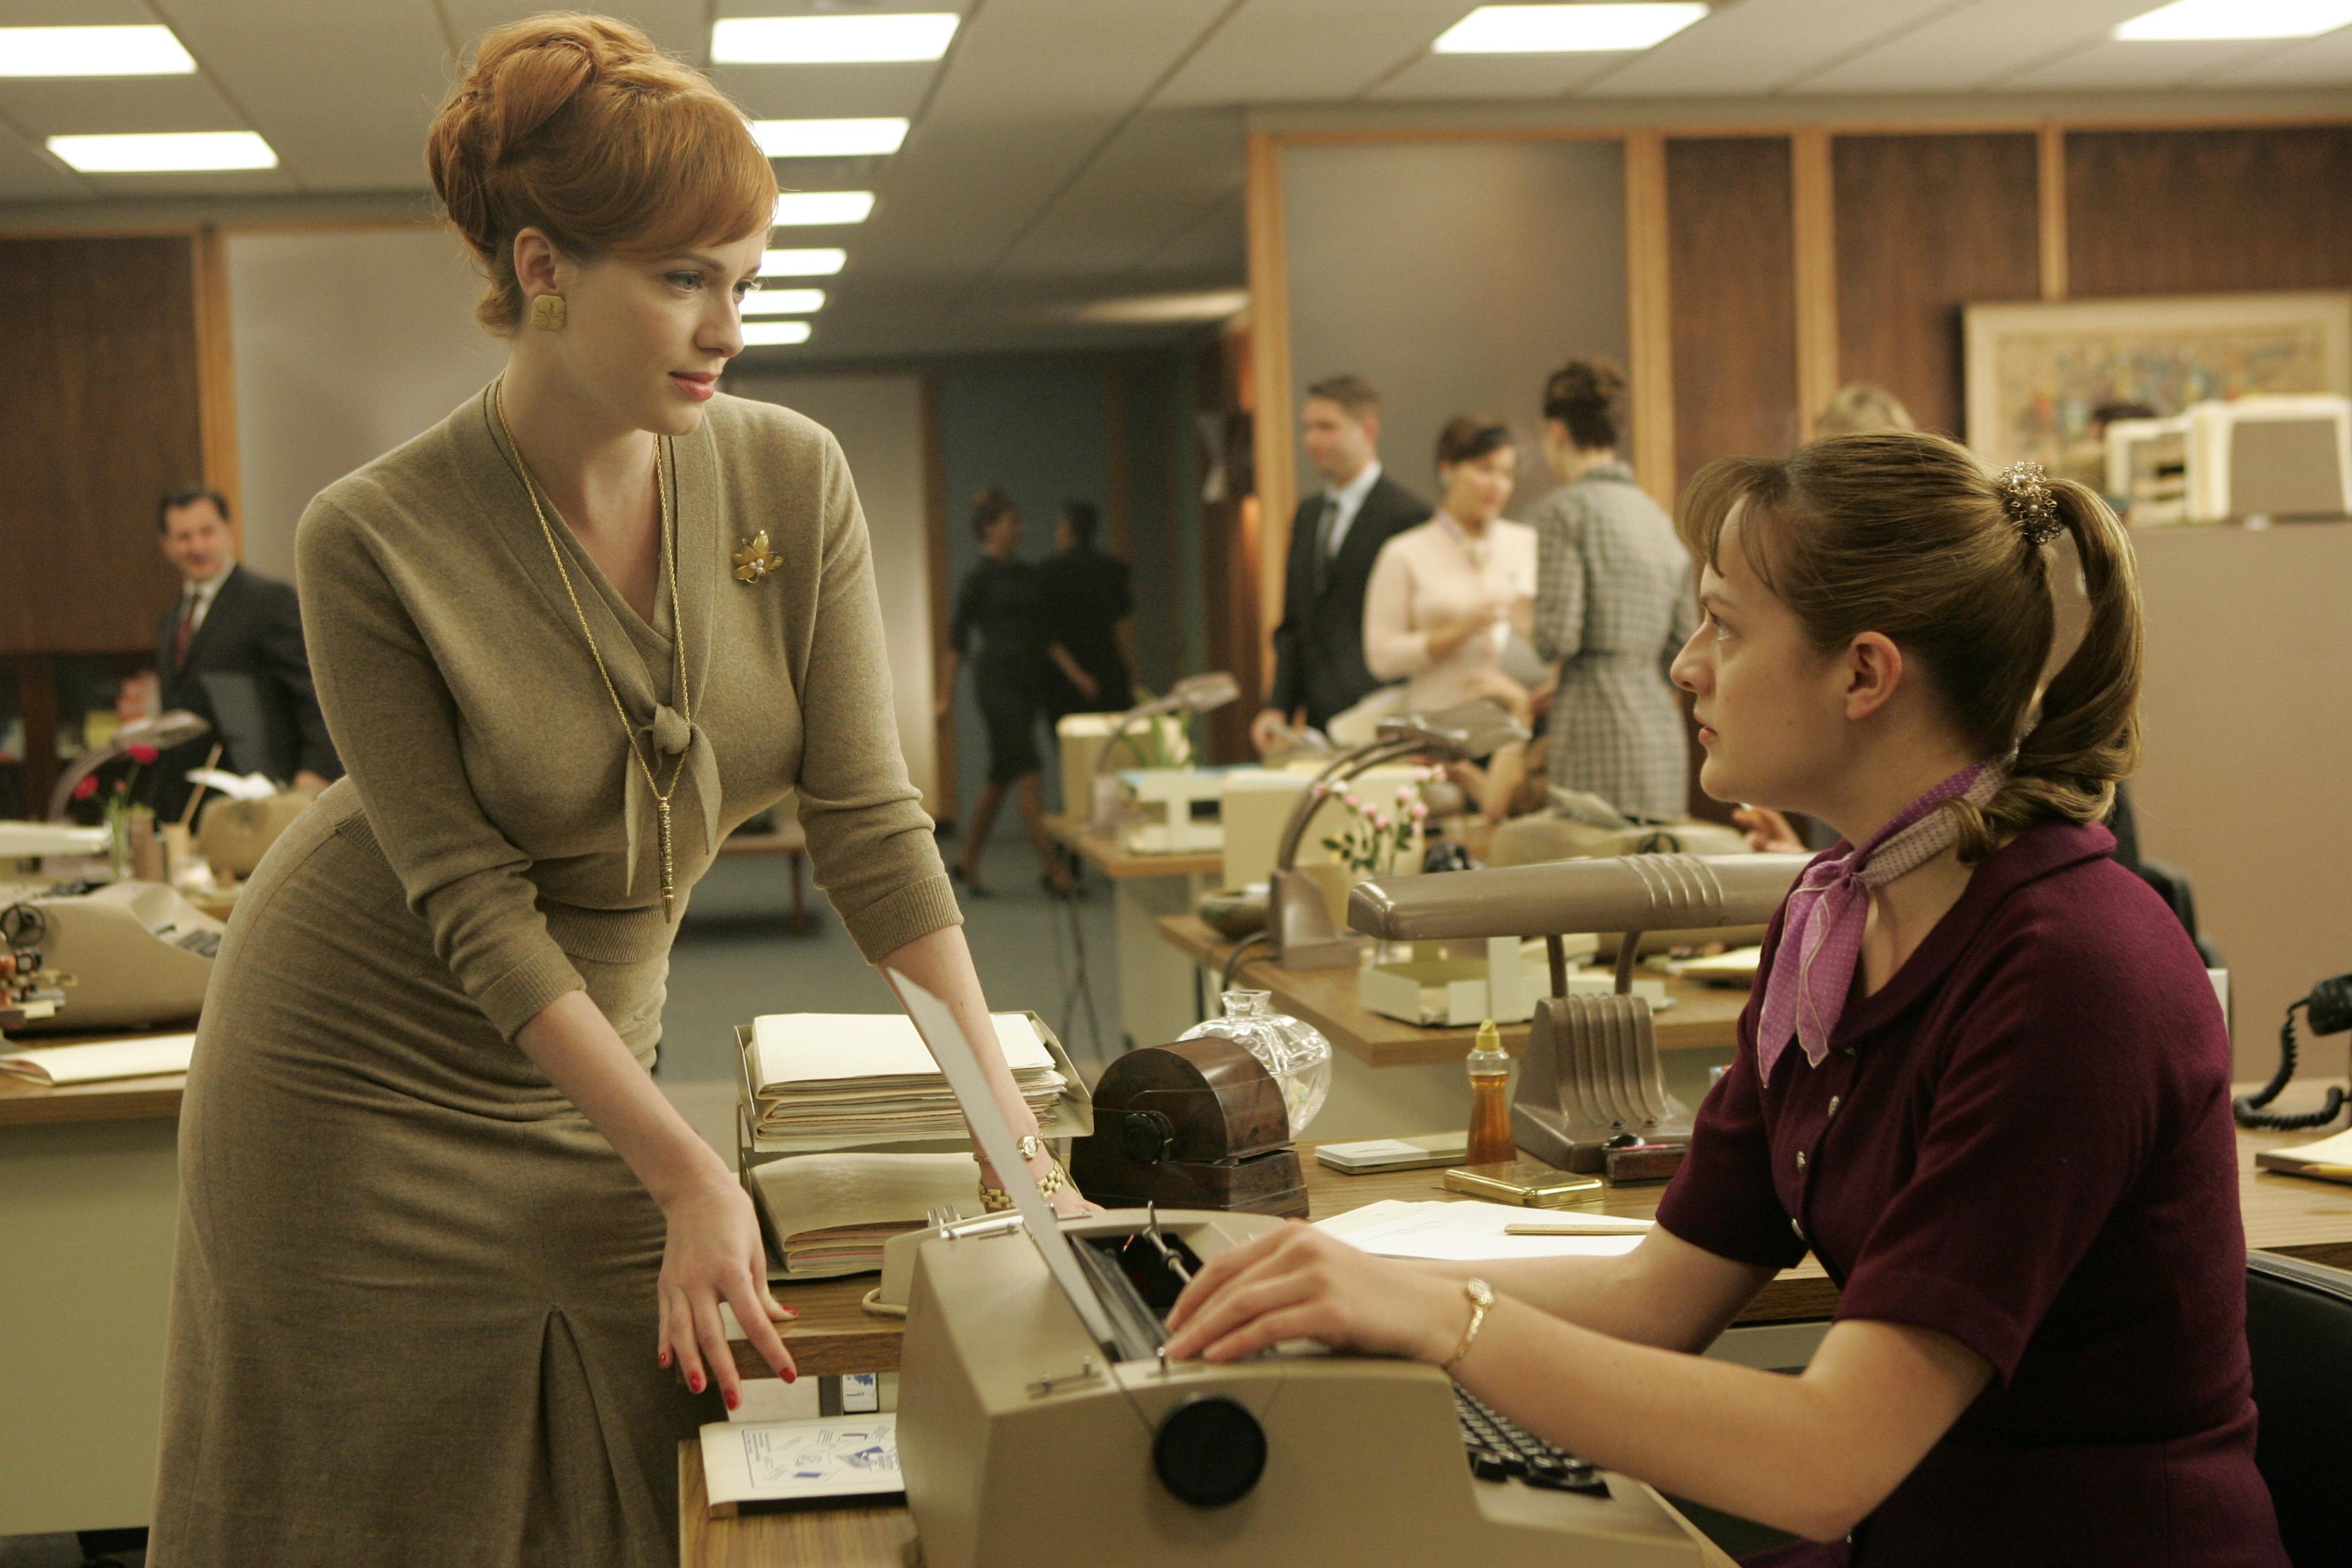 Joan Holloway (Christina Hendricks) and Peggy Olson (Elisabeth Moss) - Mad Men - Season 1, Episode 2 - Photo Credit: Doug Hyun/AMC